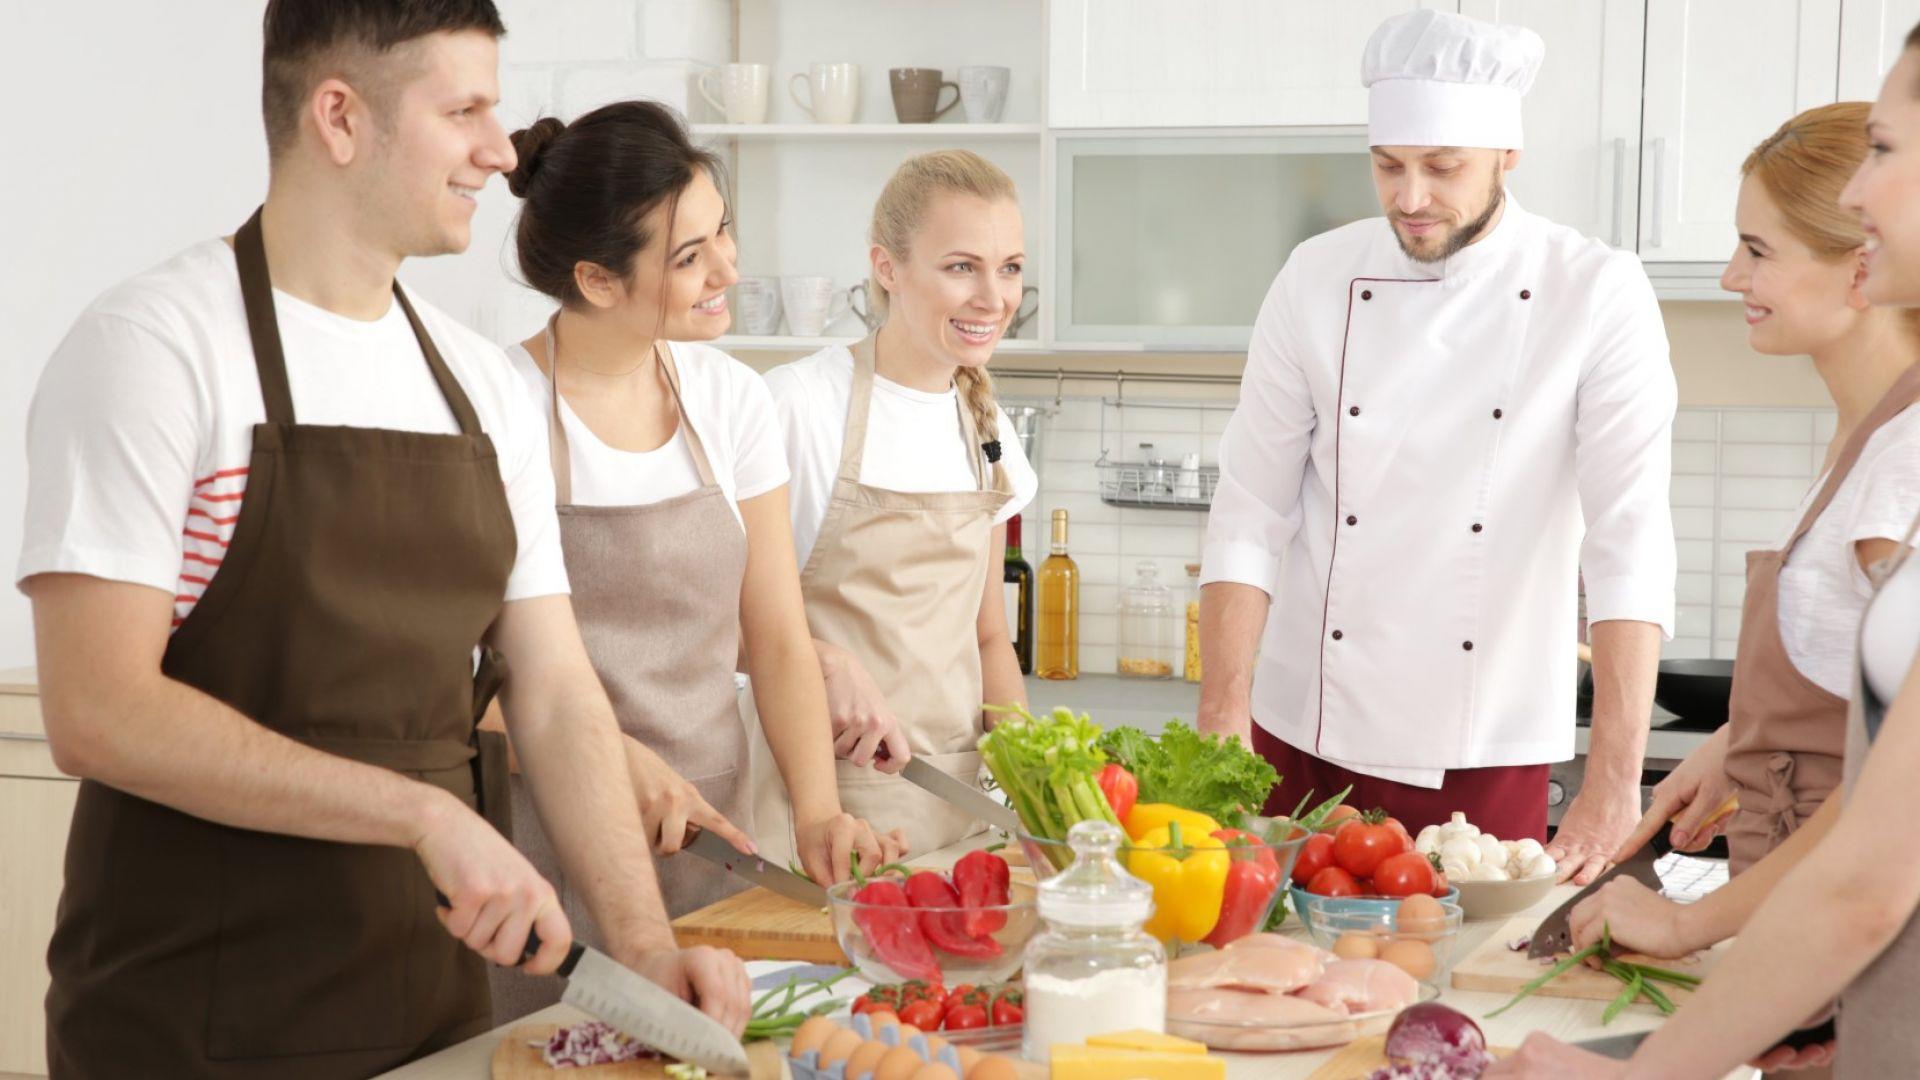 Виж кой спечели ваучер за кулинарен курс от Miele и Yummy cooking